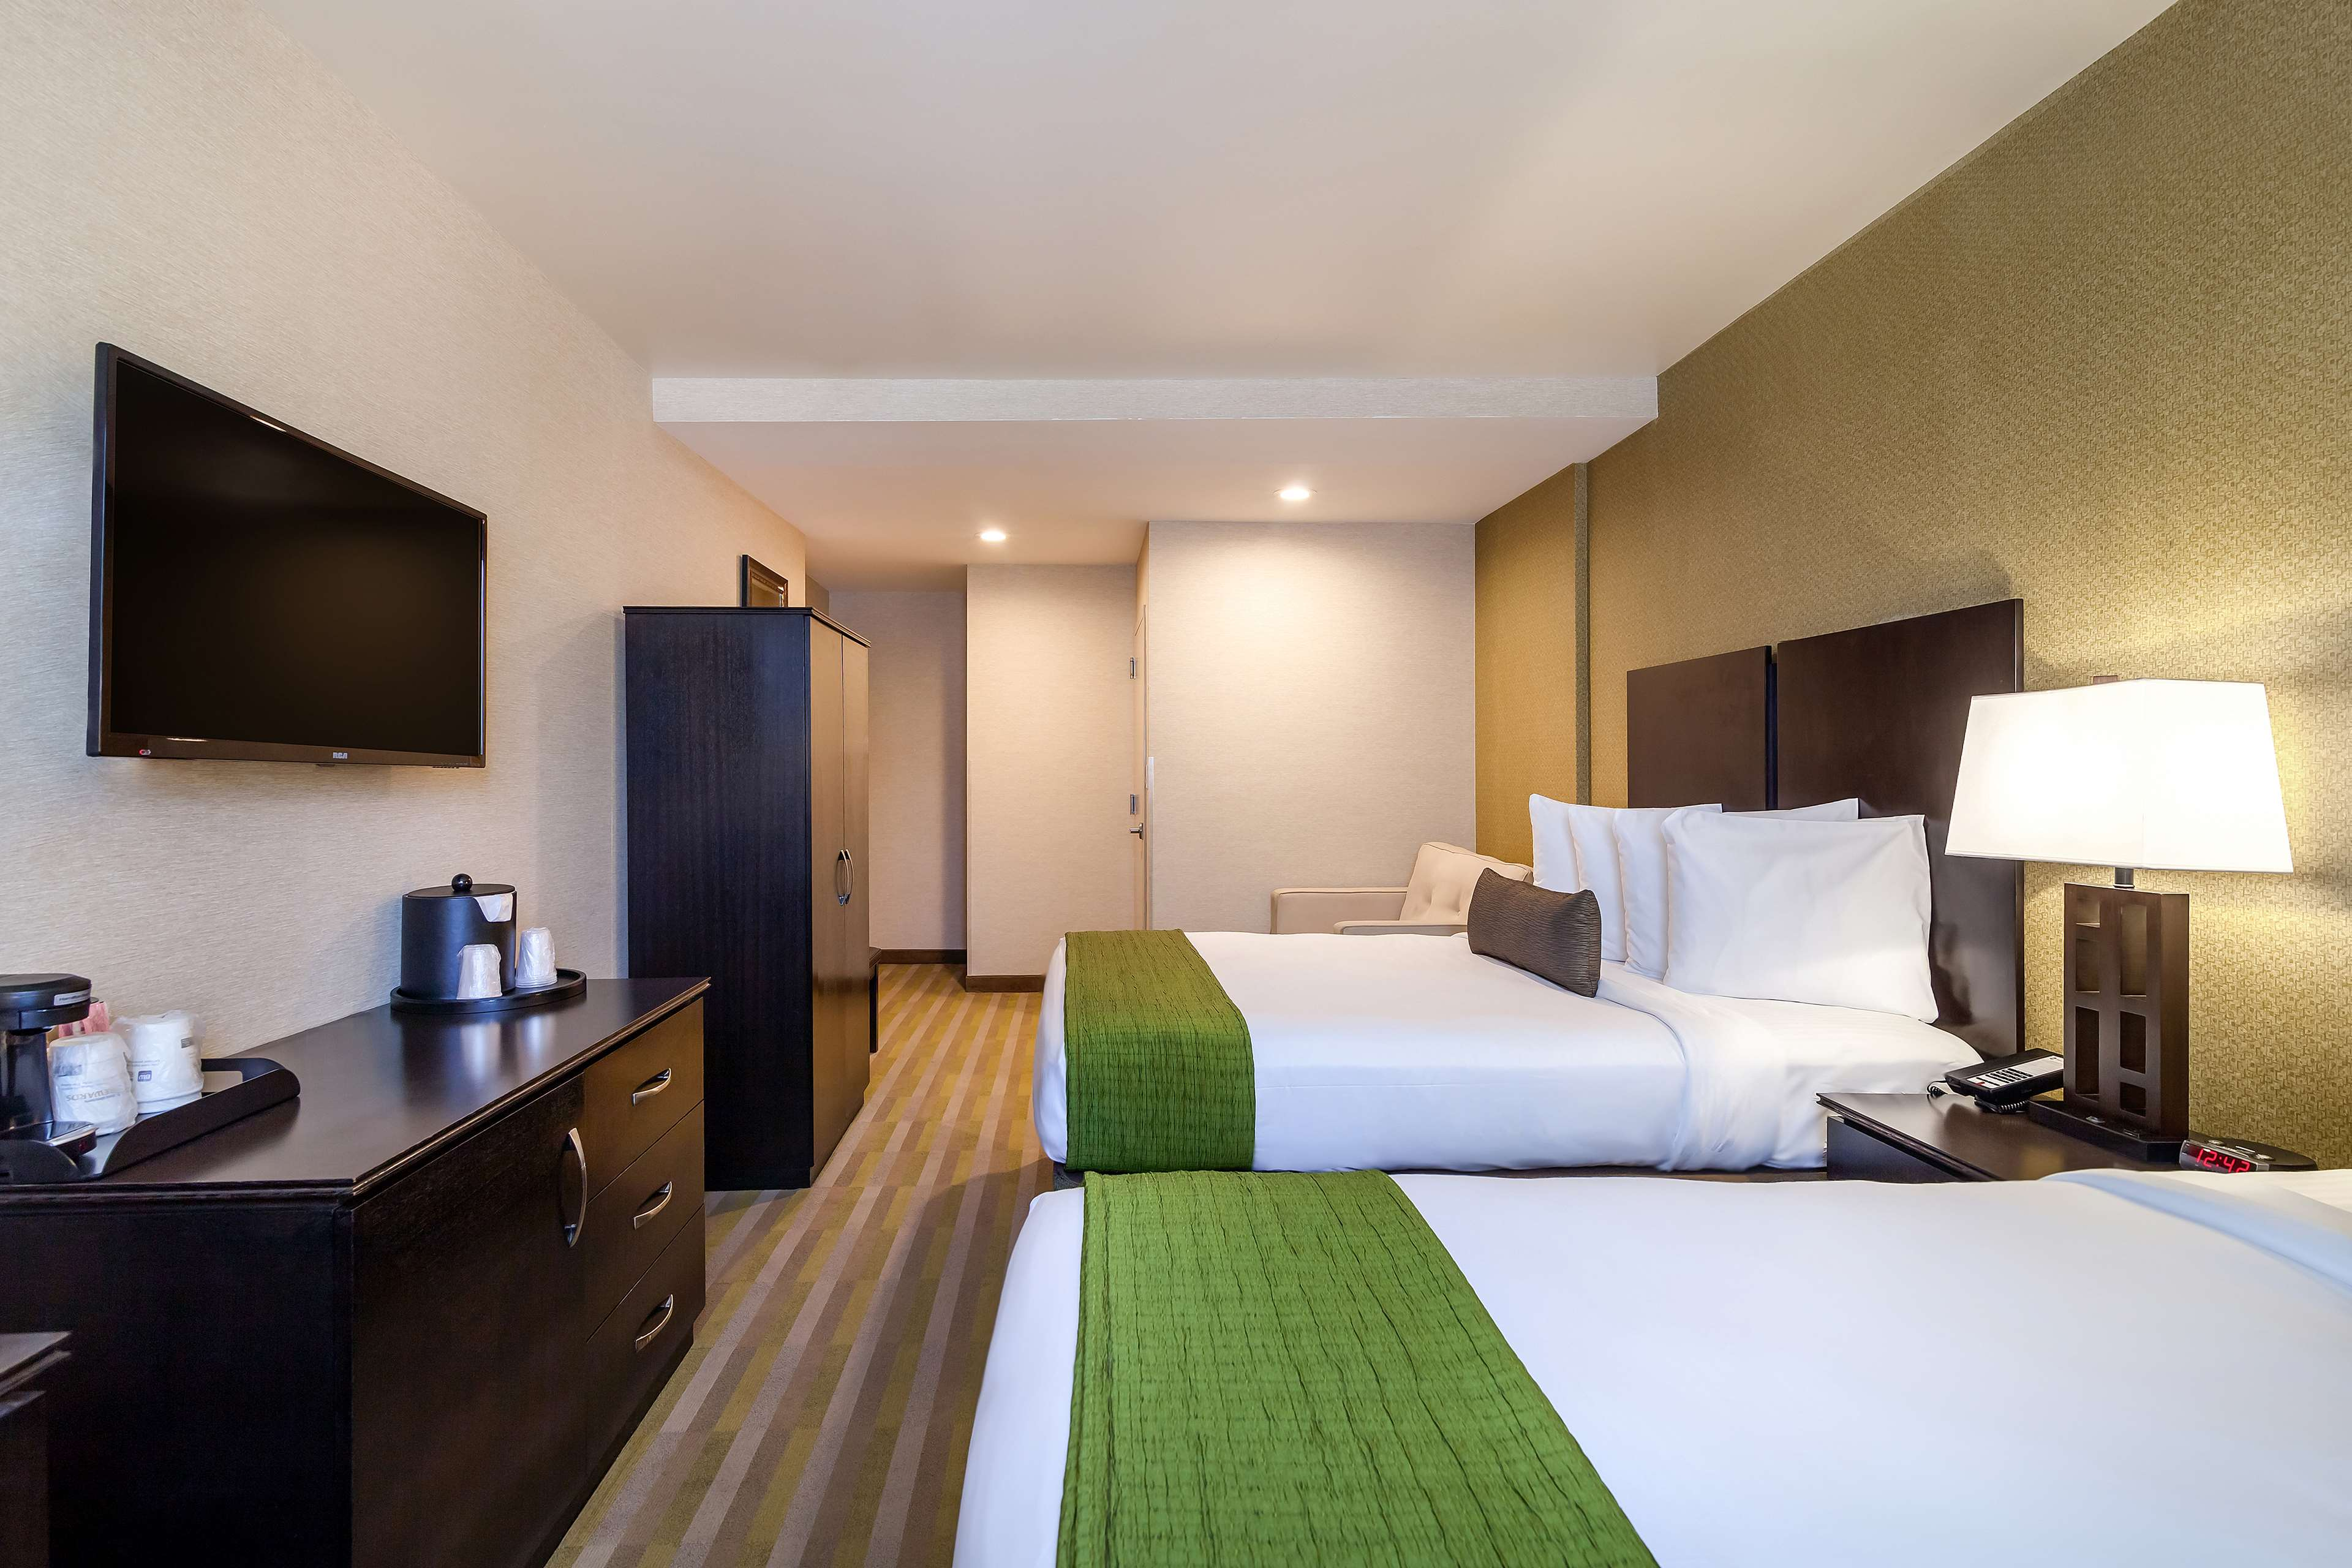 Best Western Plus Plaza Hotel image 29